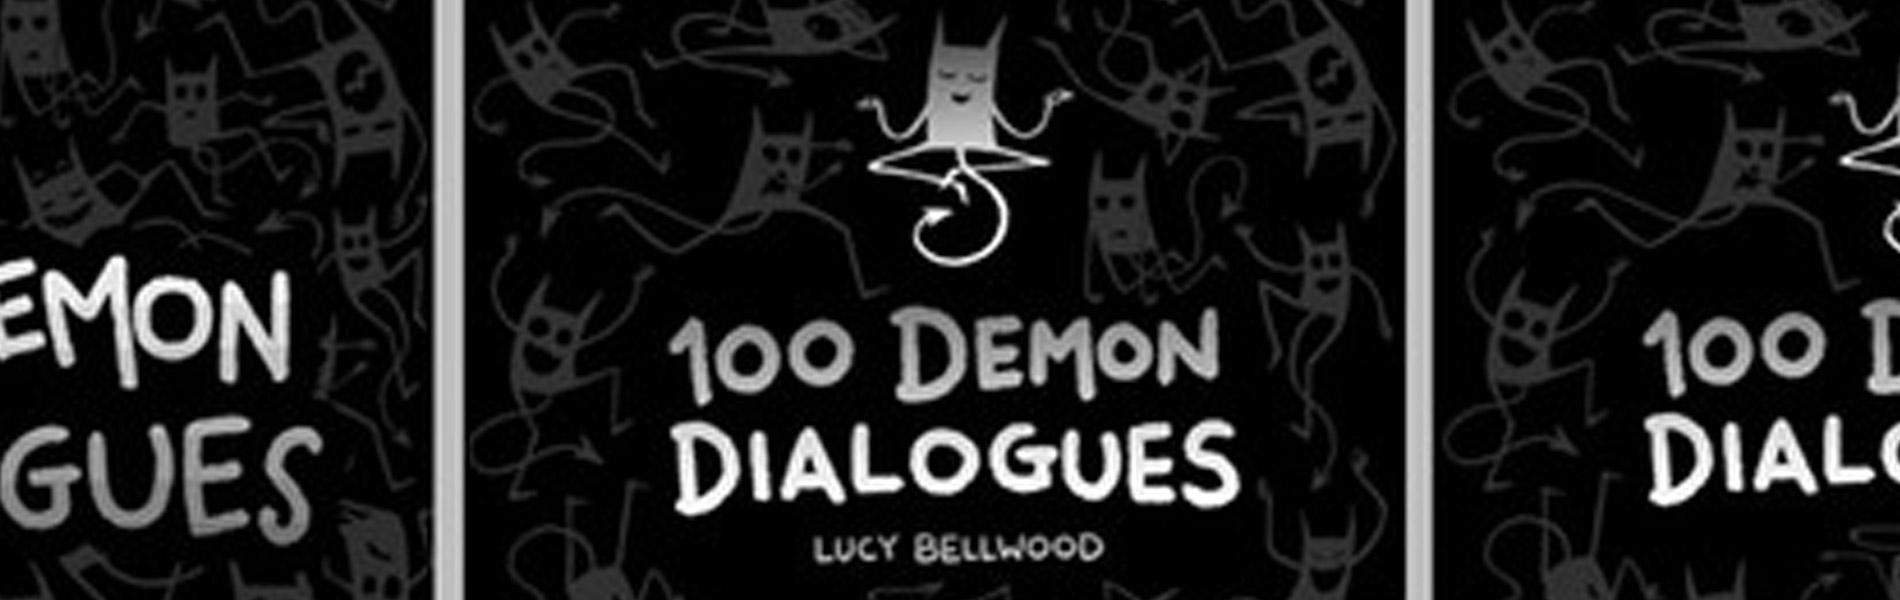 God of Comics – 100 Demon Dialogues